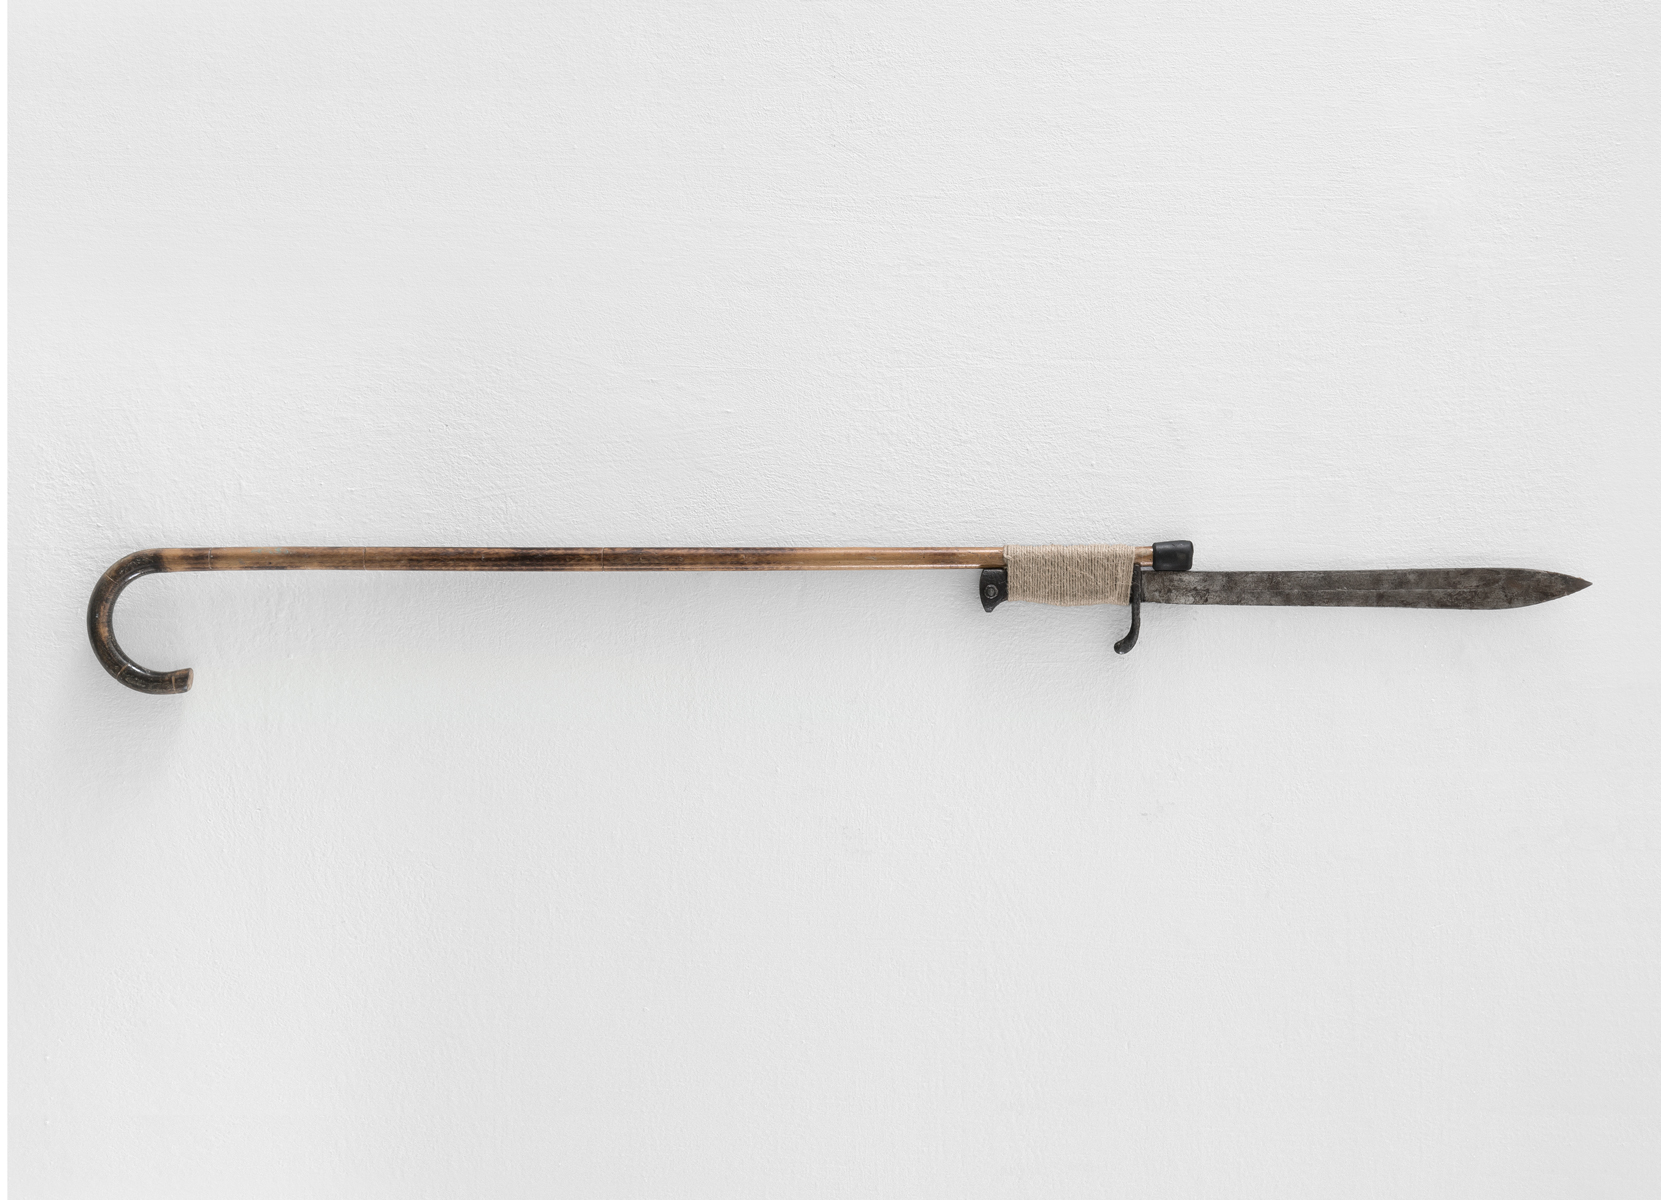 ACTUS PURUS / Cane / 2016 / 124 x 12 x 2,5 cm / walking cane, bayonet, twine